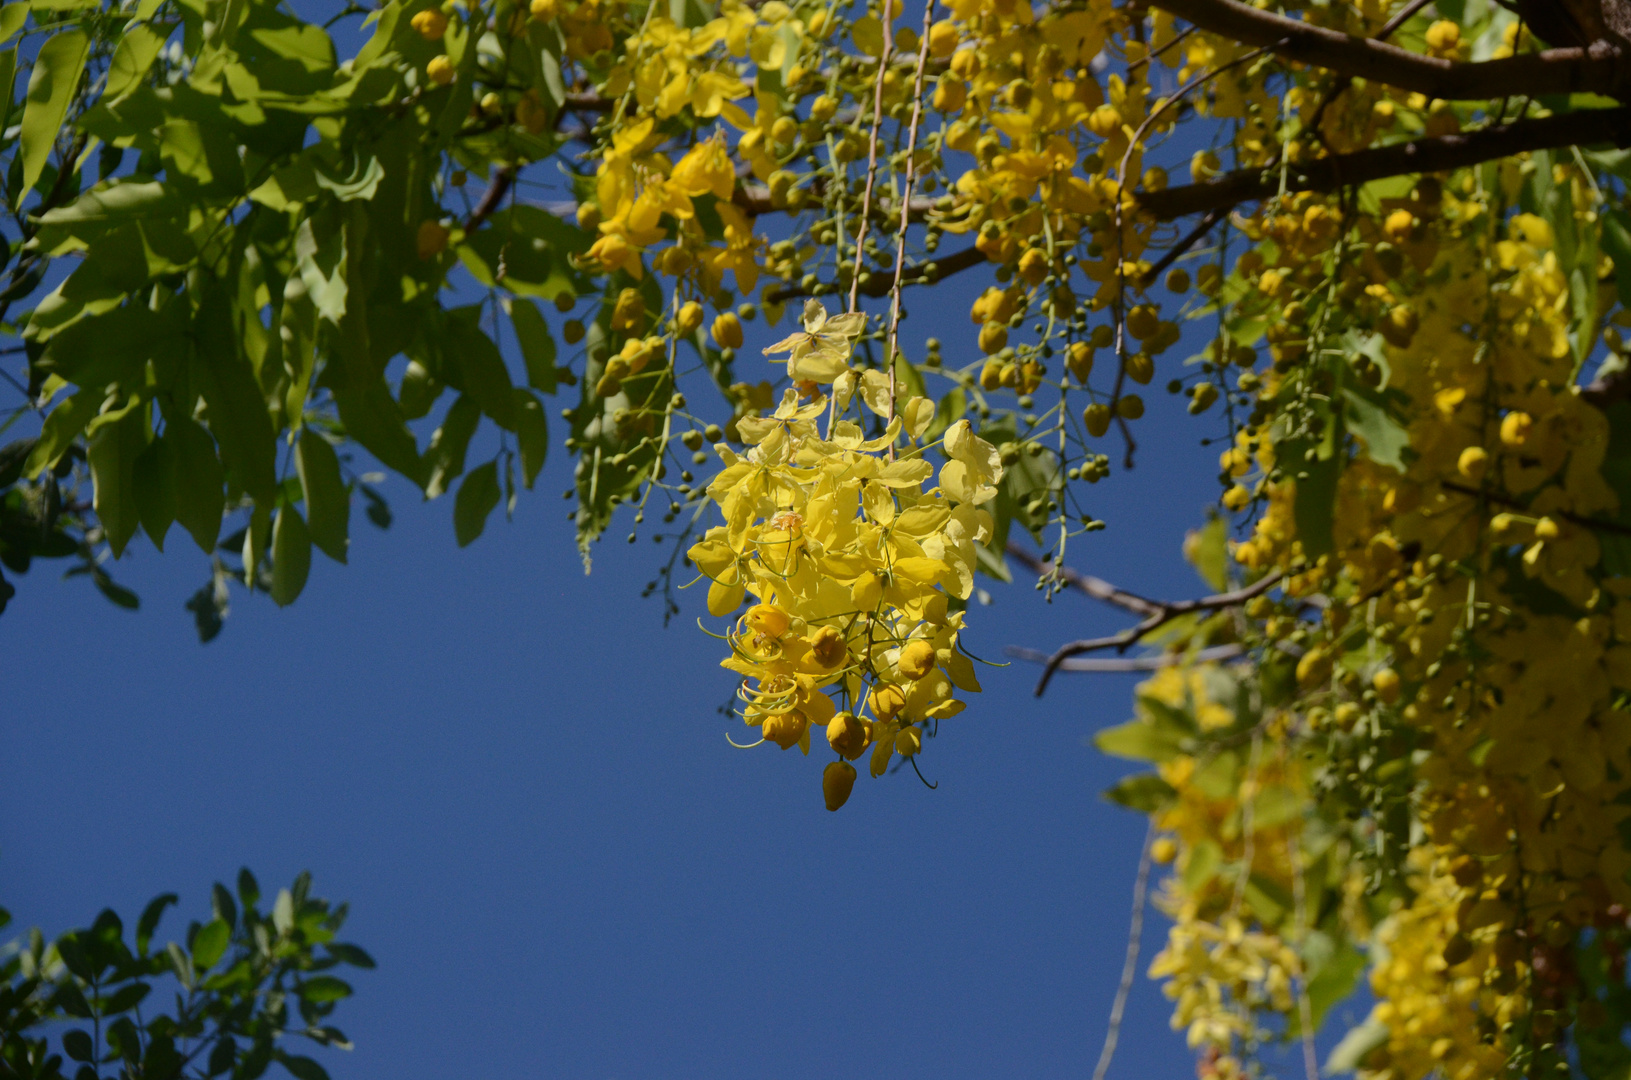 La Réunion : Indischer Goldregen (Cassia fistula) in St. Gilles